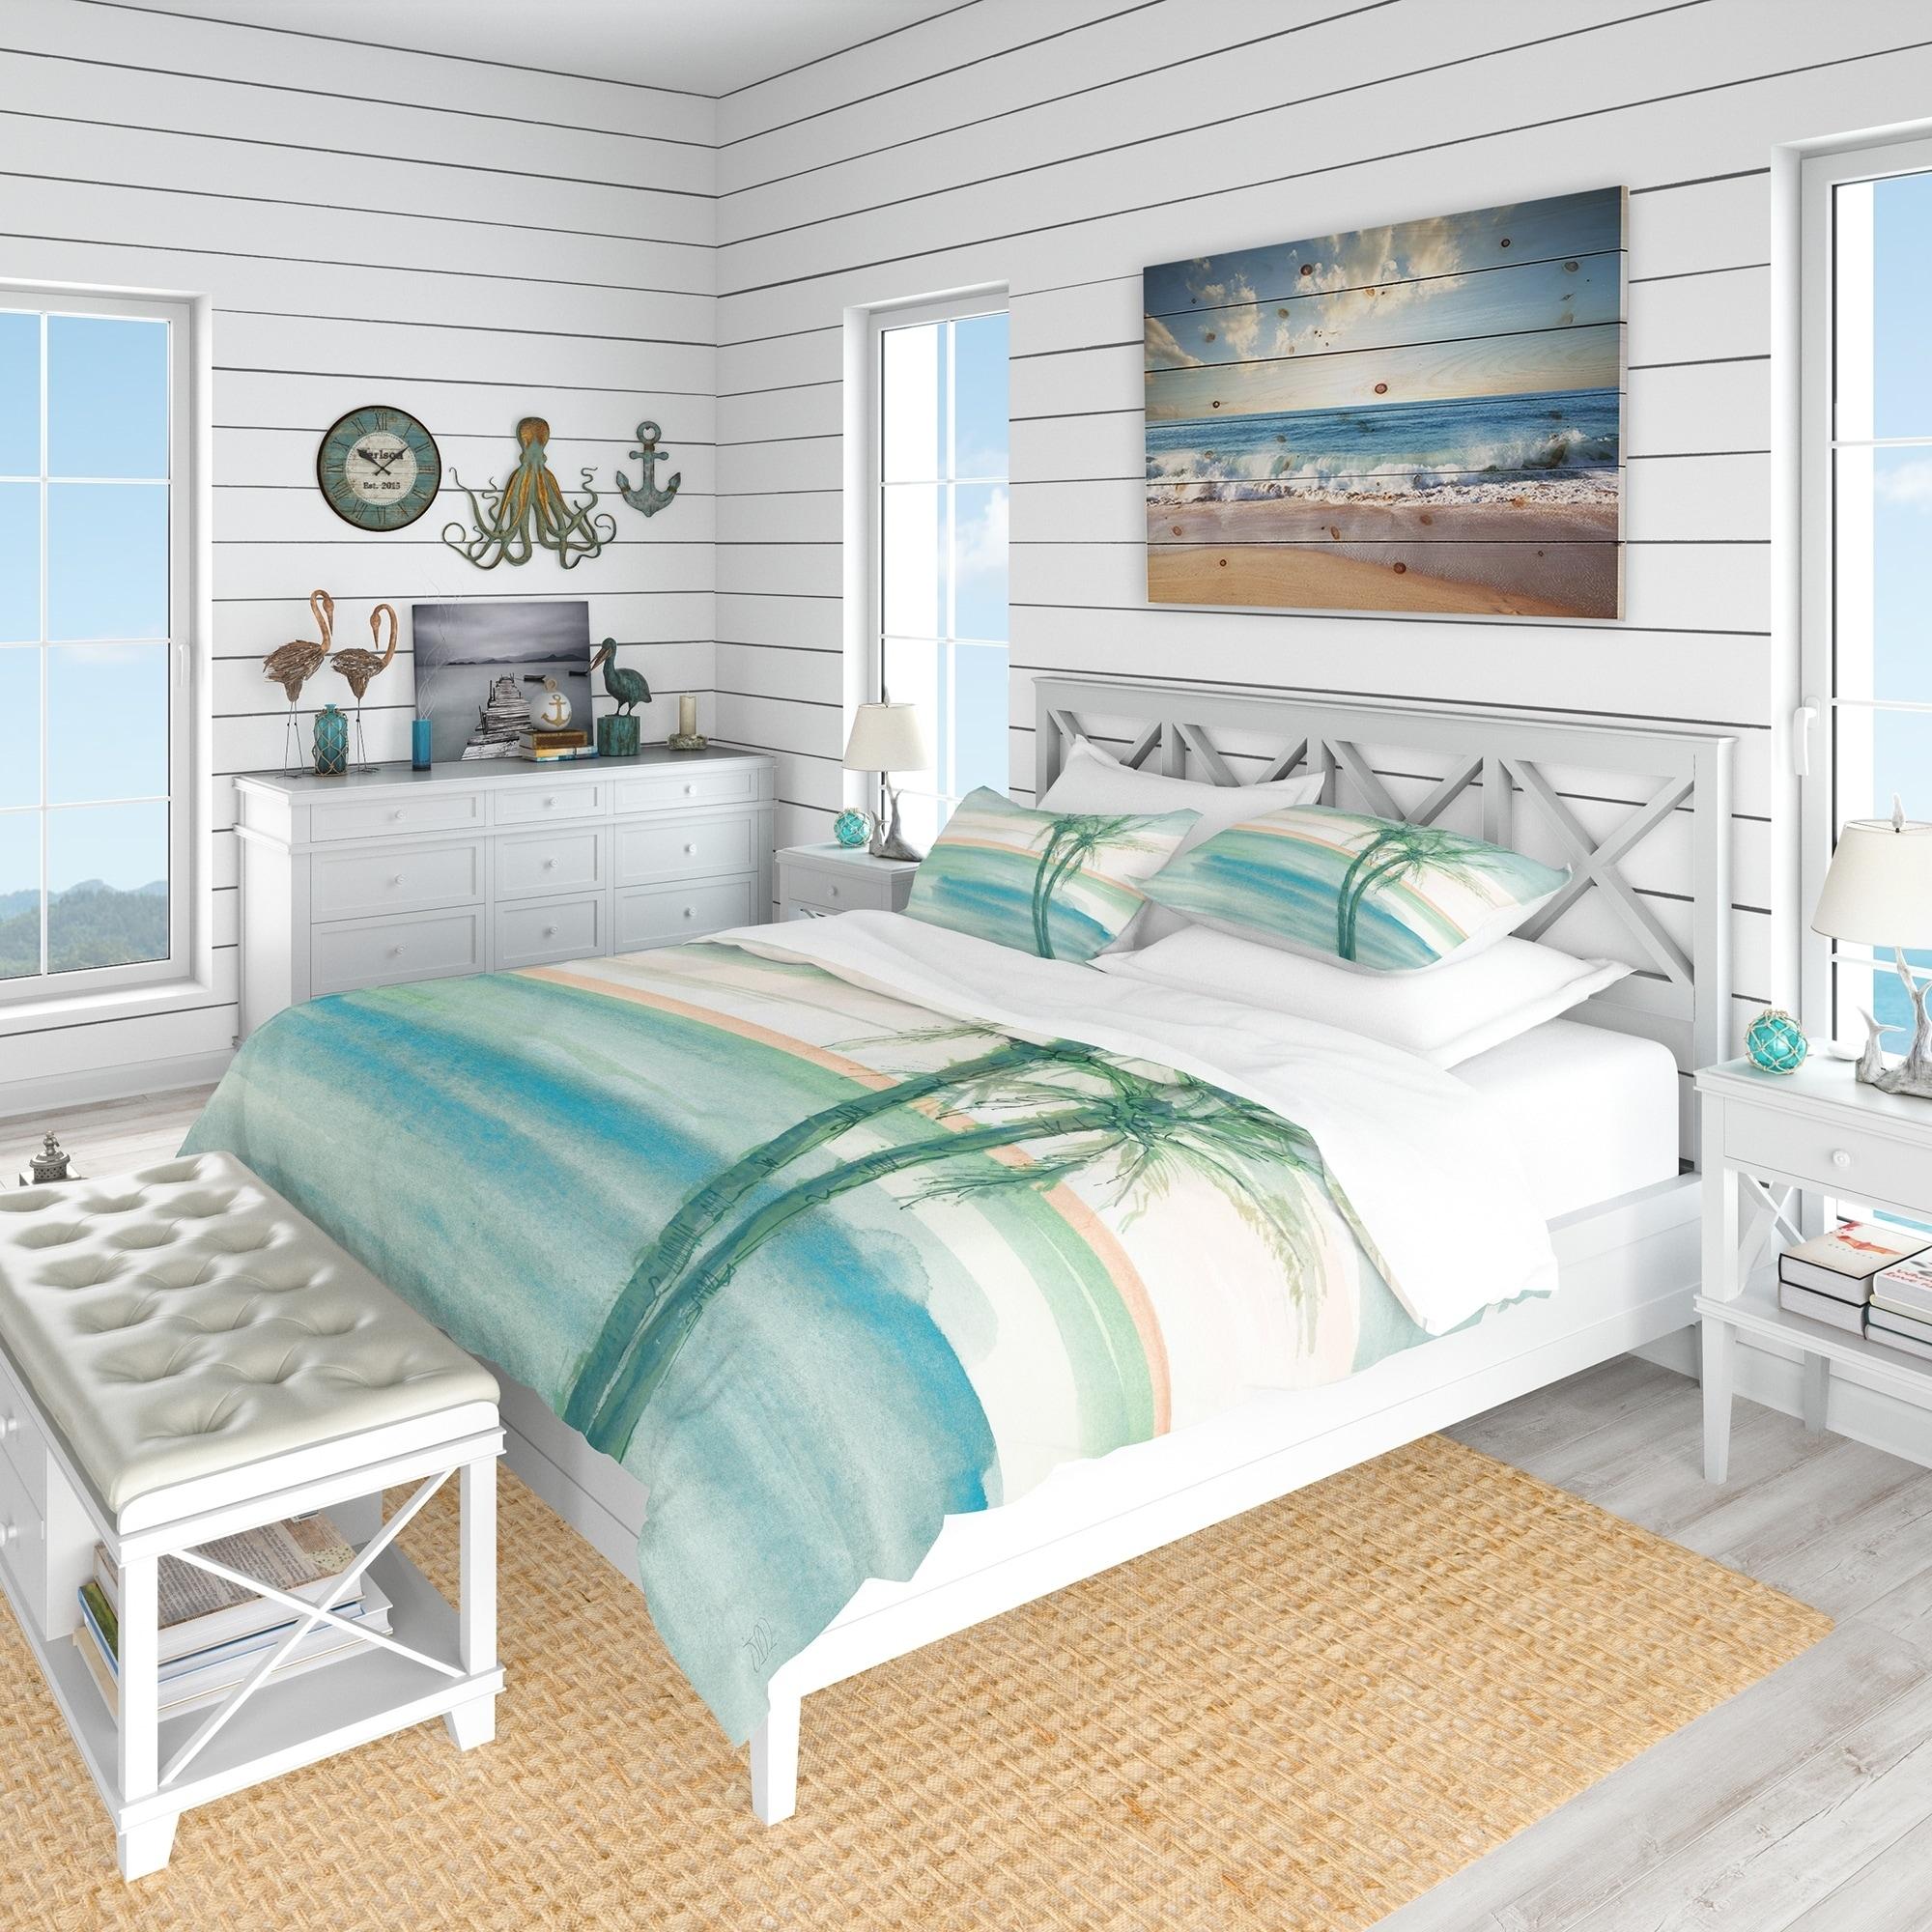 Designart Peaceful Dusk Ii Tropical Coastal Bedding Set Duvet Cover Shams Overstock 25971449